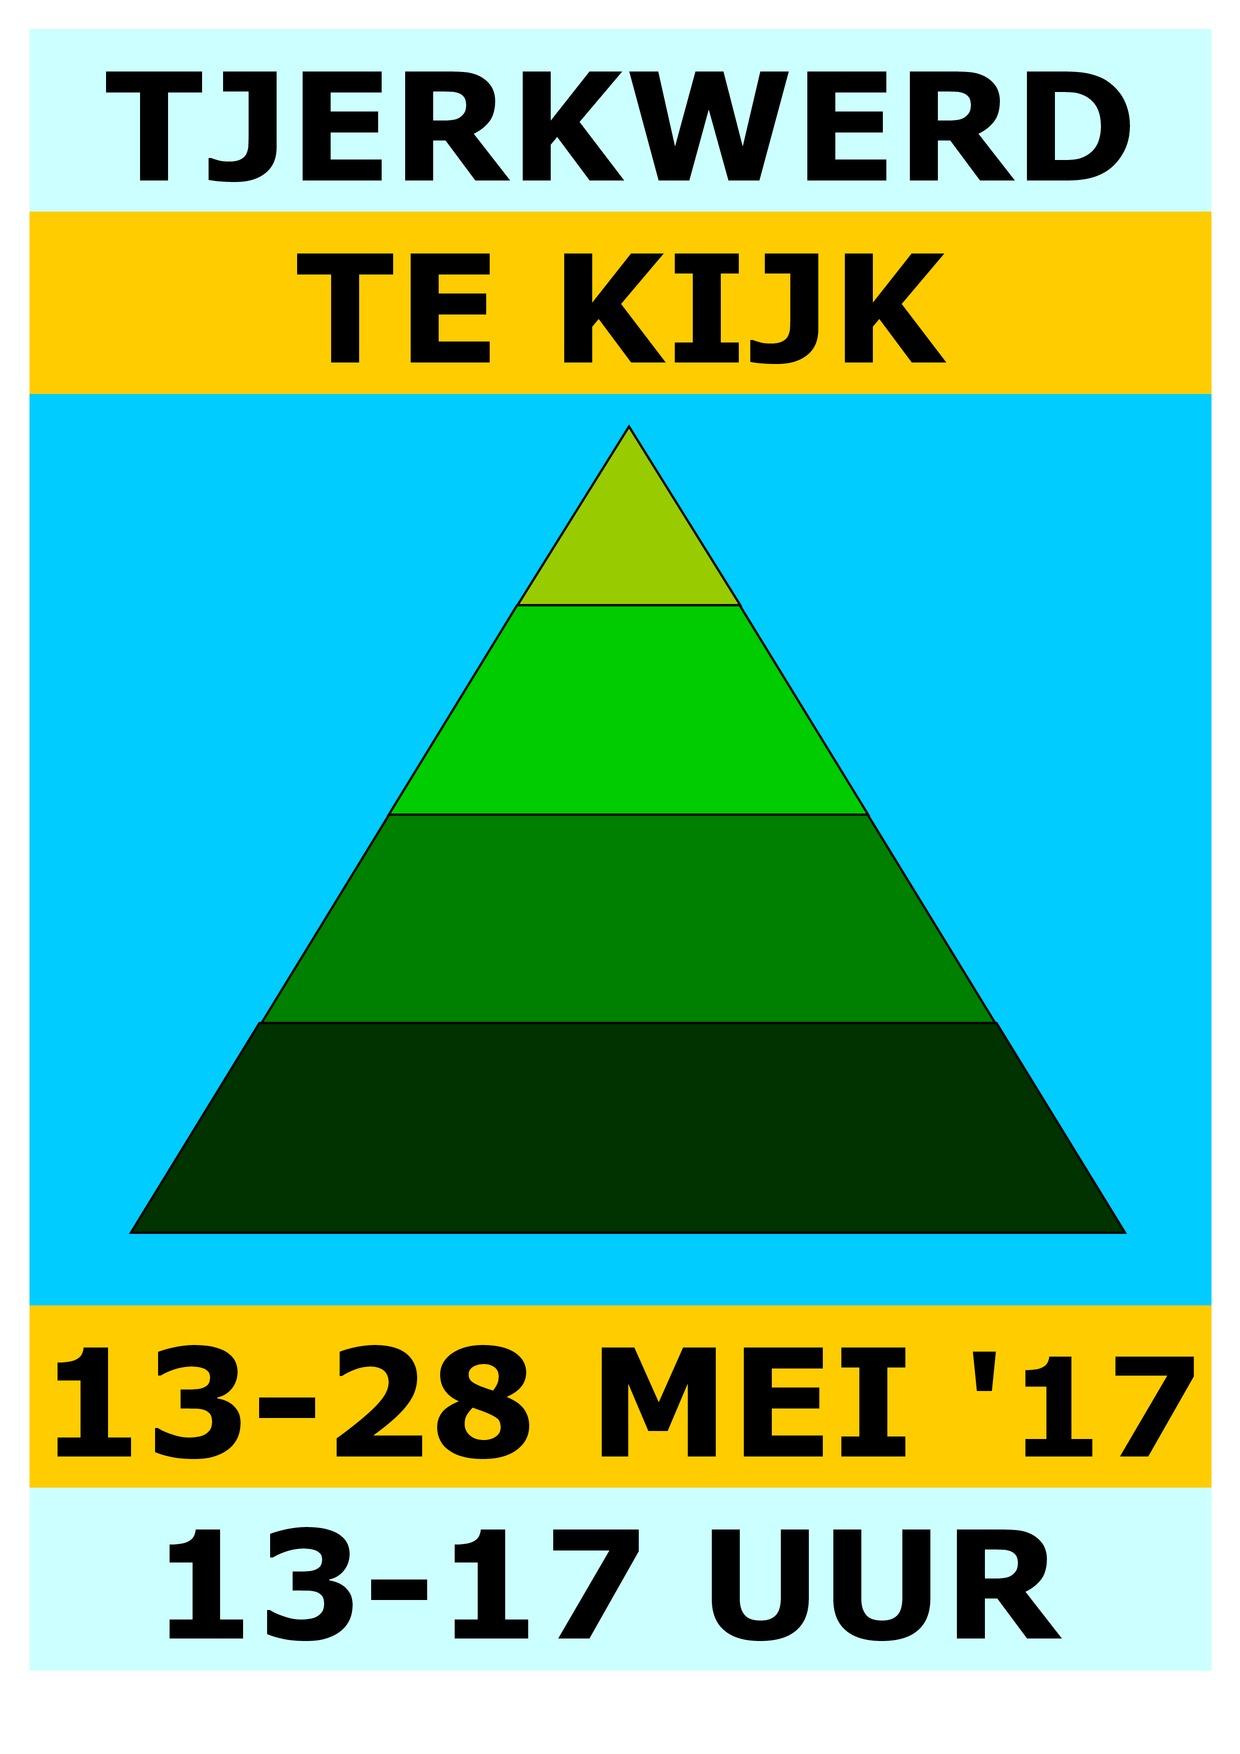 logo_-_tjerkwerd_te_kijk-page0.jpg